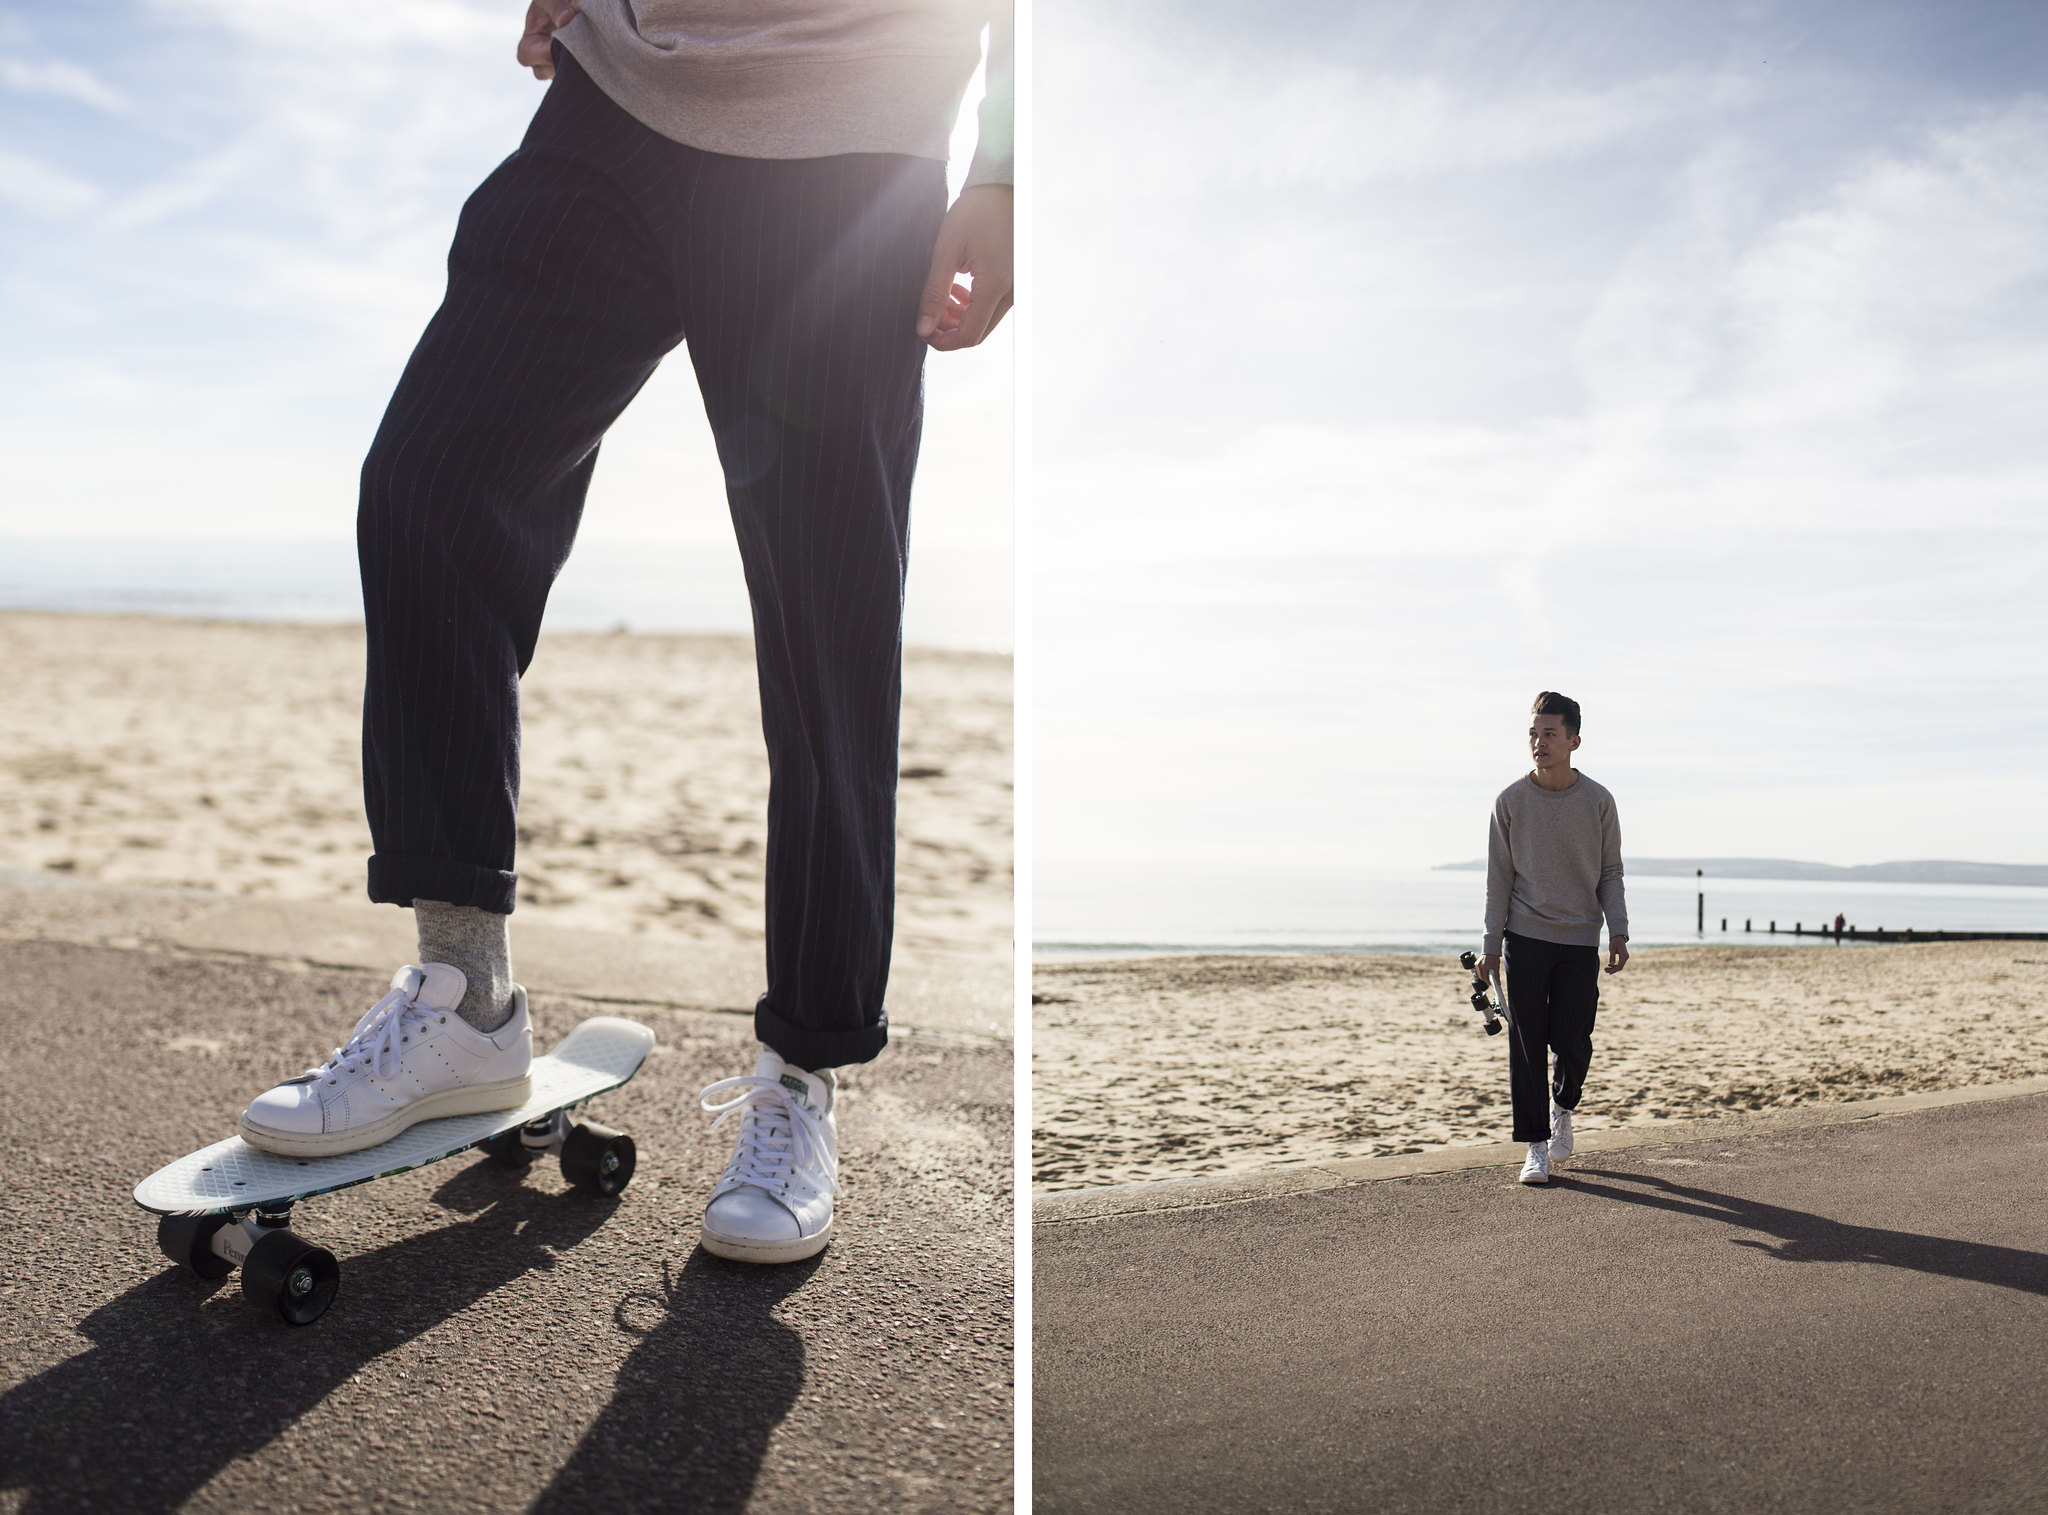 Jordan_Bunker_penny_skateboards_11